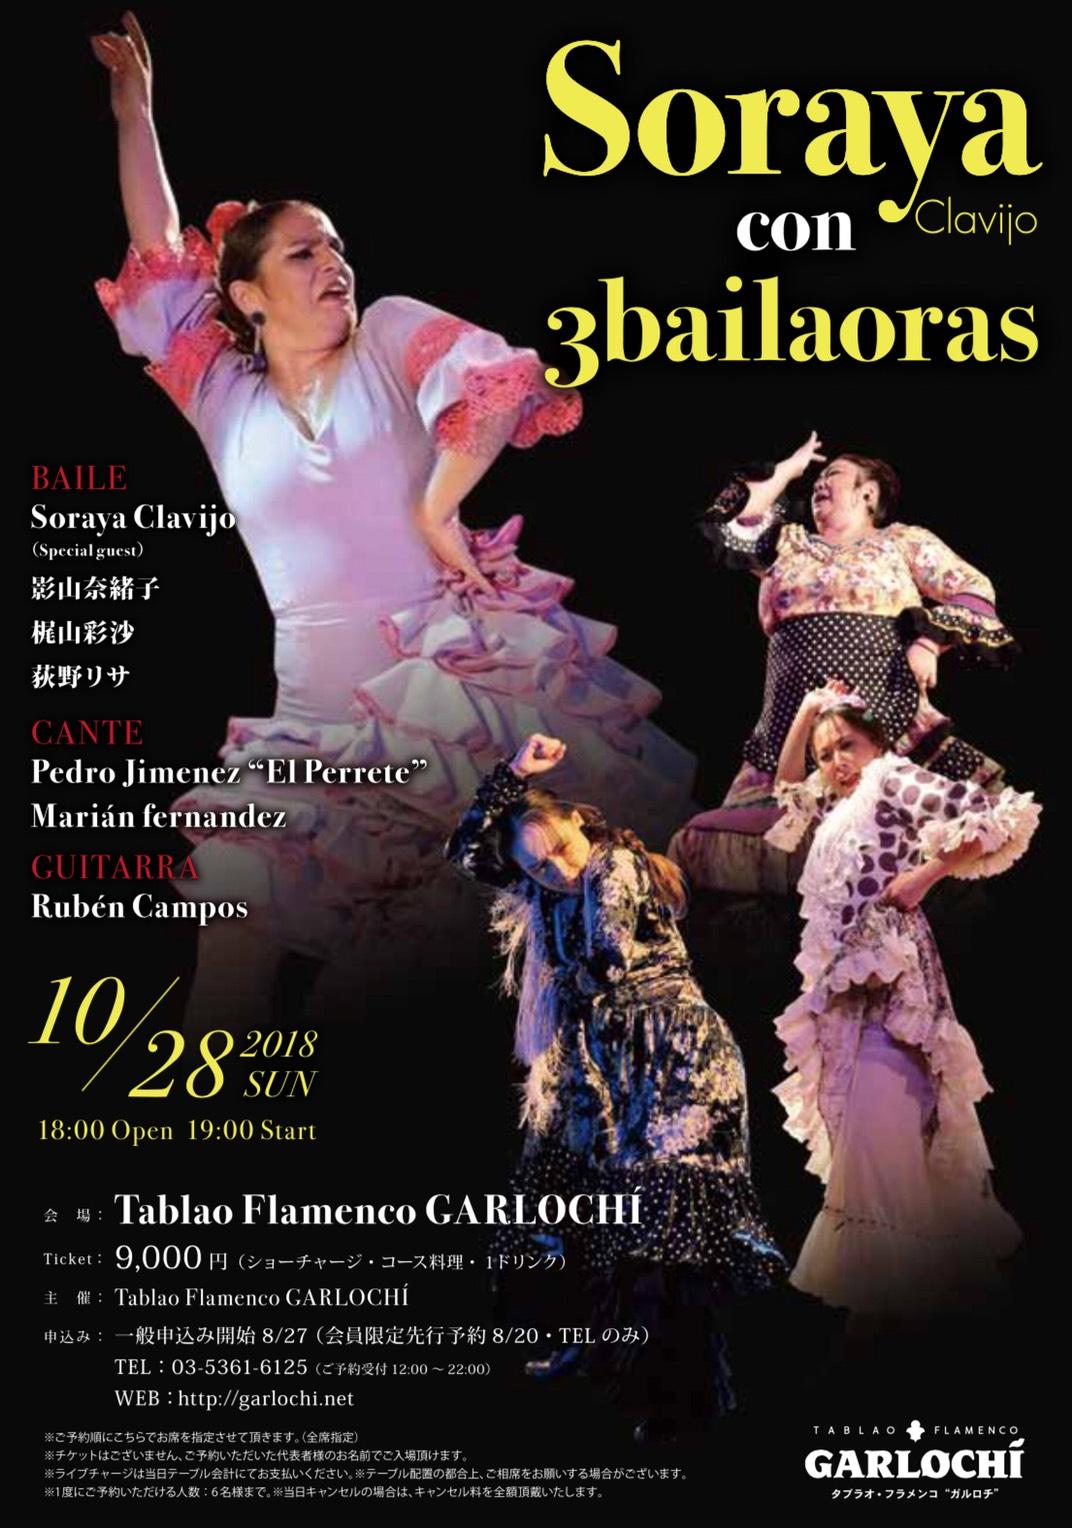 Soraya Clavijo con Tres bailaoras